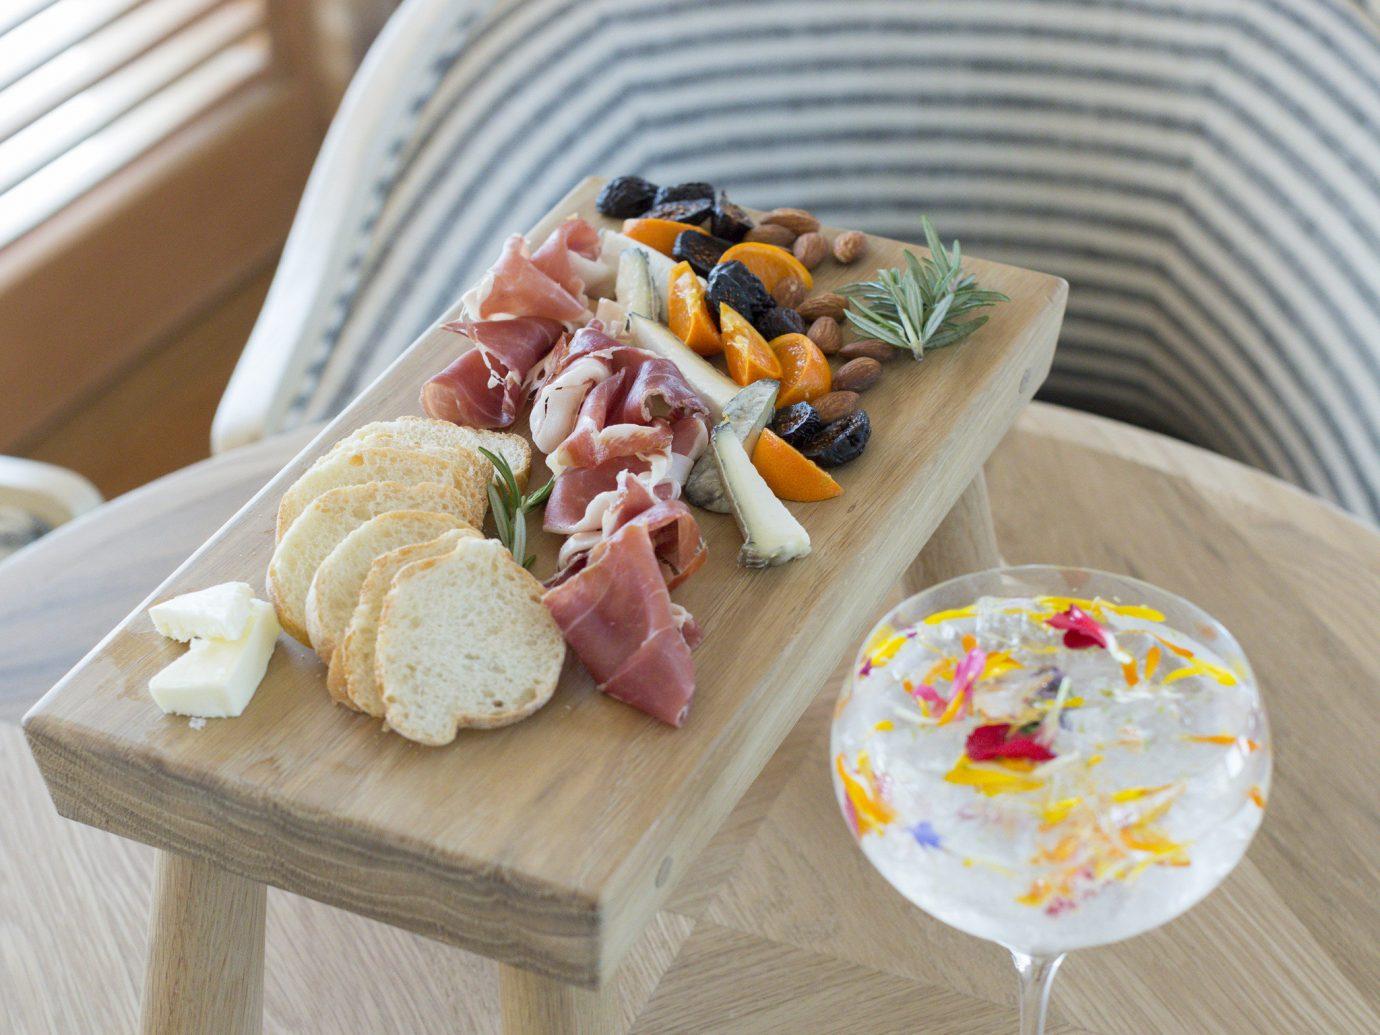 Offbeat table indoor food tableware brunch cuisine dish breakfast meal finger food recipe serveware